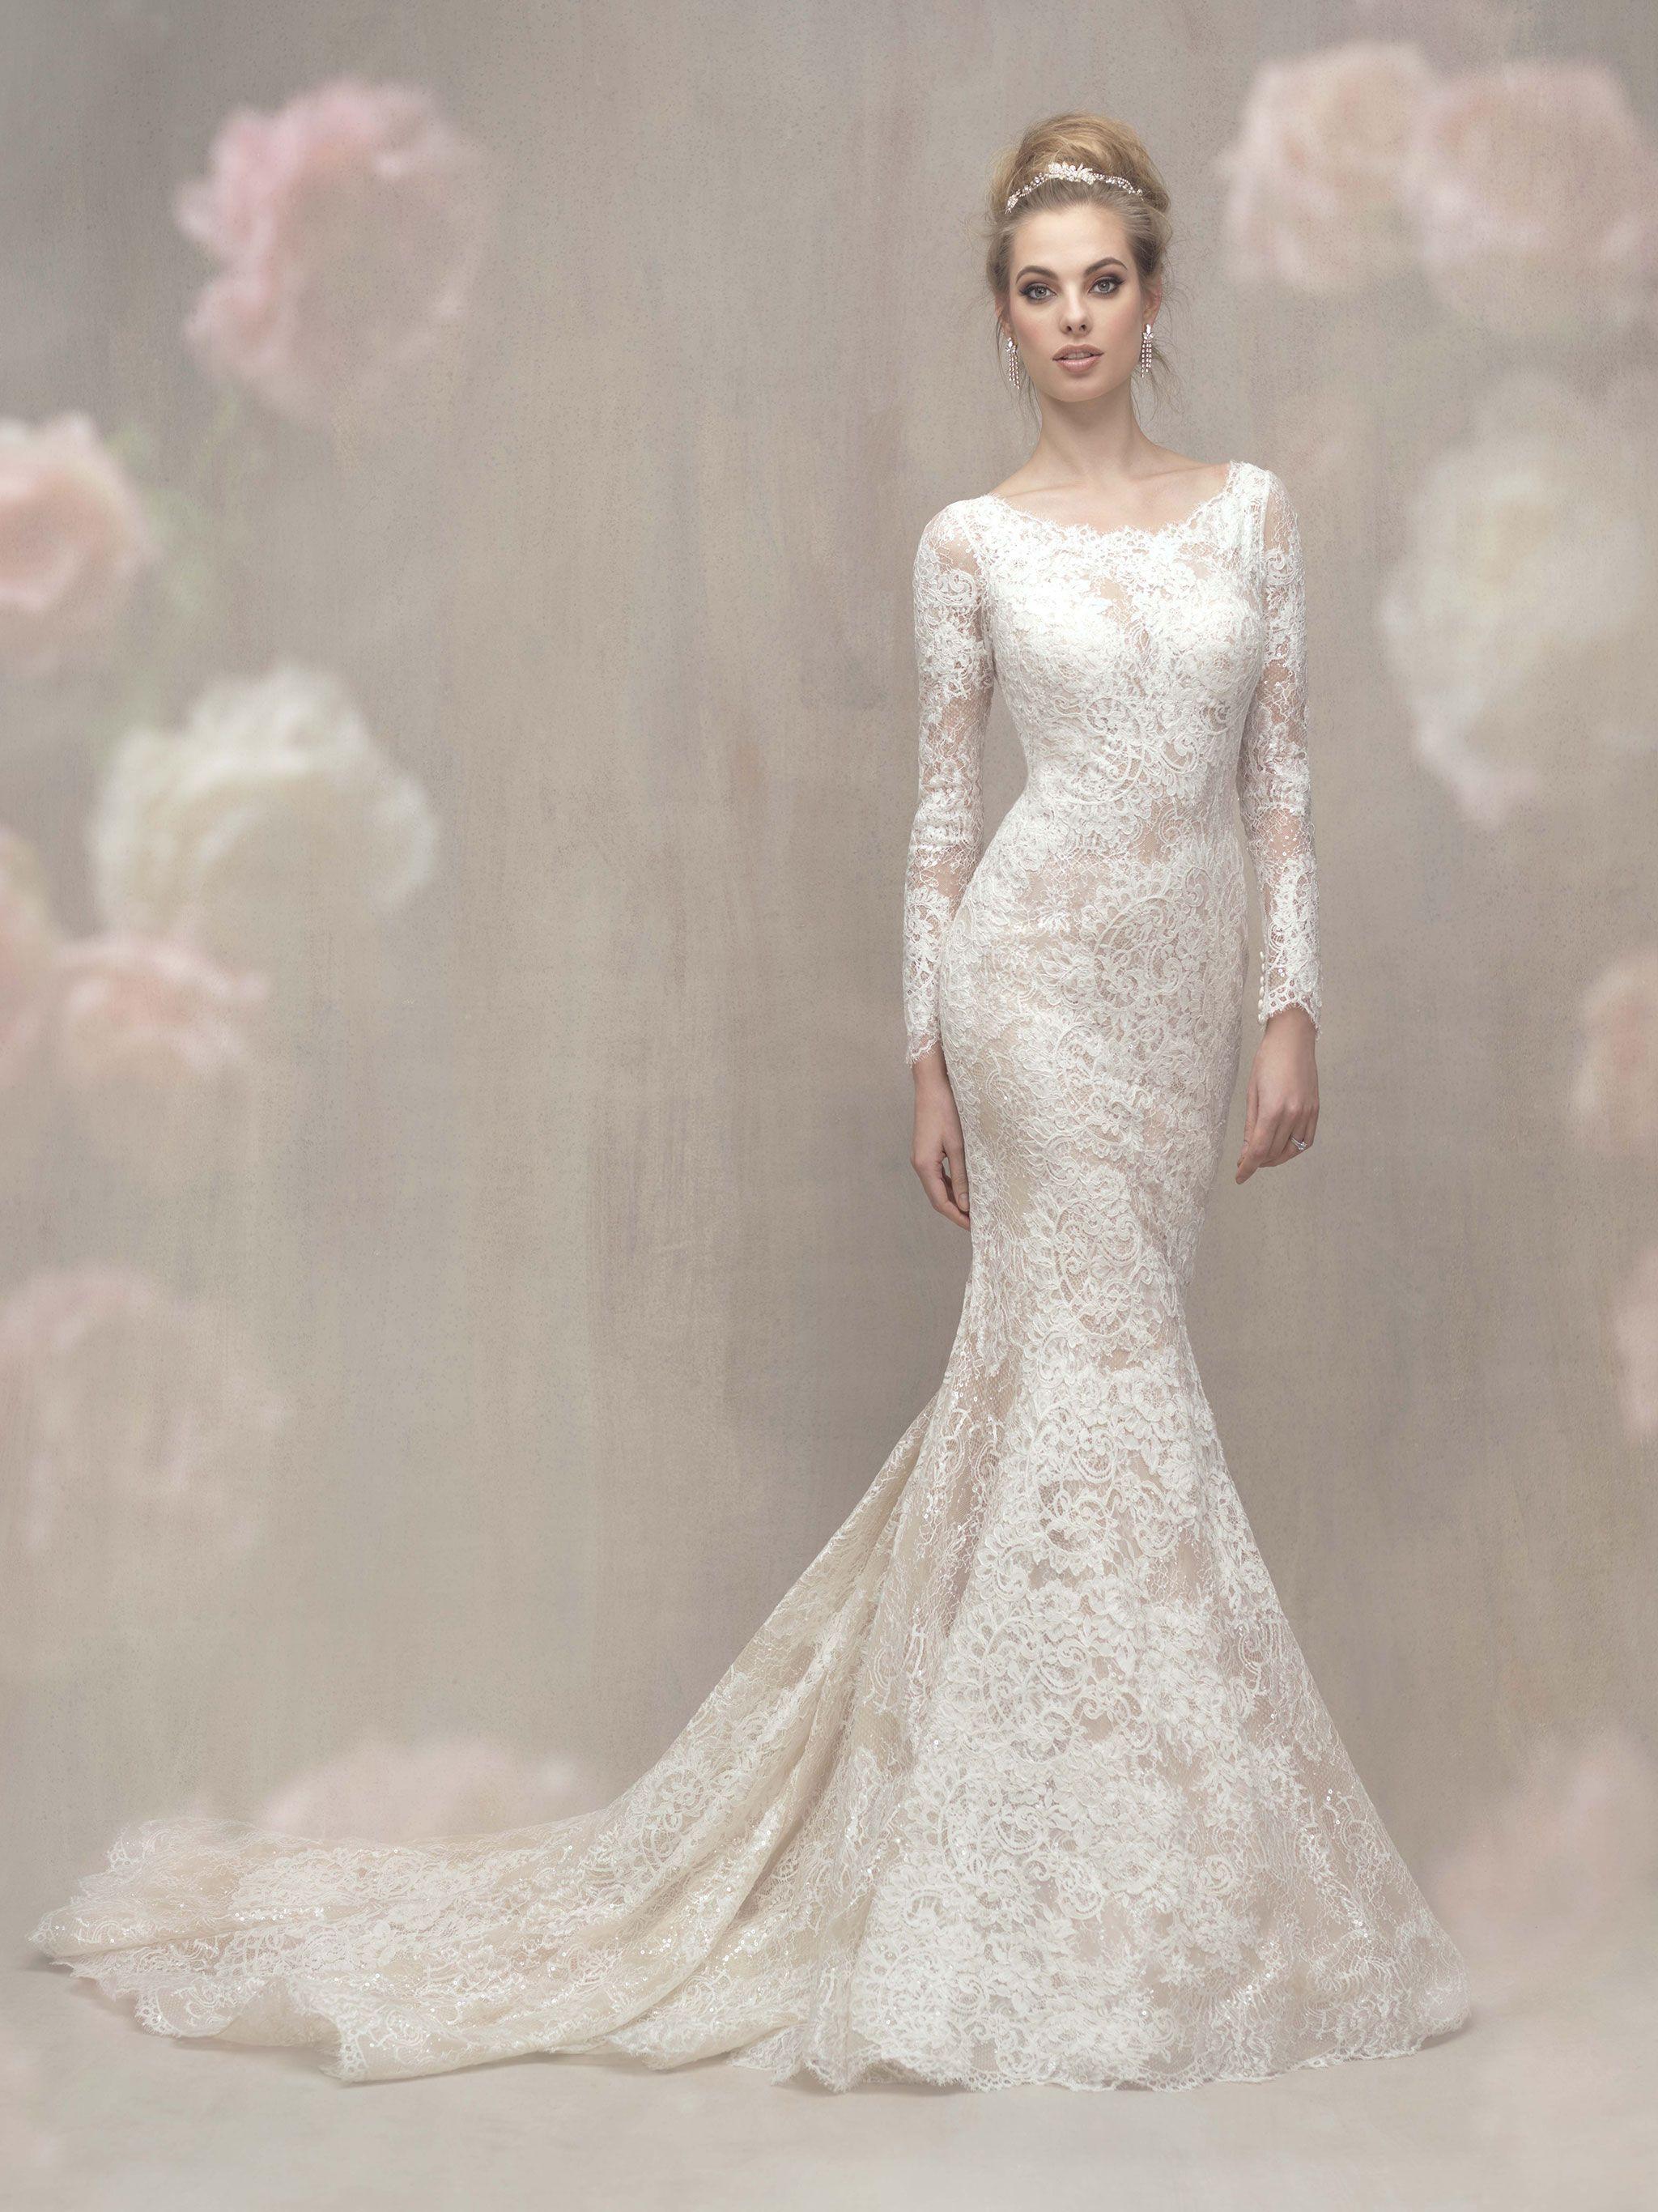 Dresses for a winter wedding reception   Allure Bridal Couture C uc  Modest Wedding  Pinterest